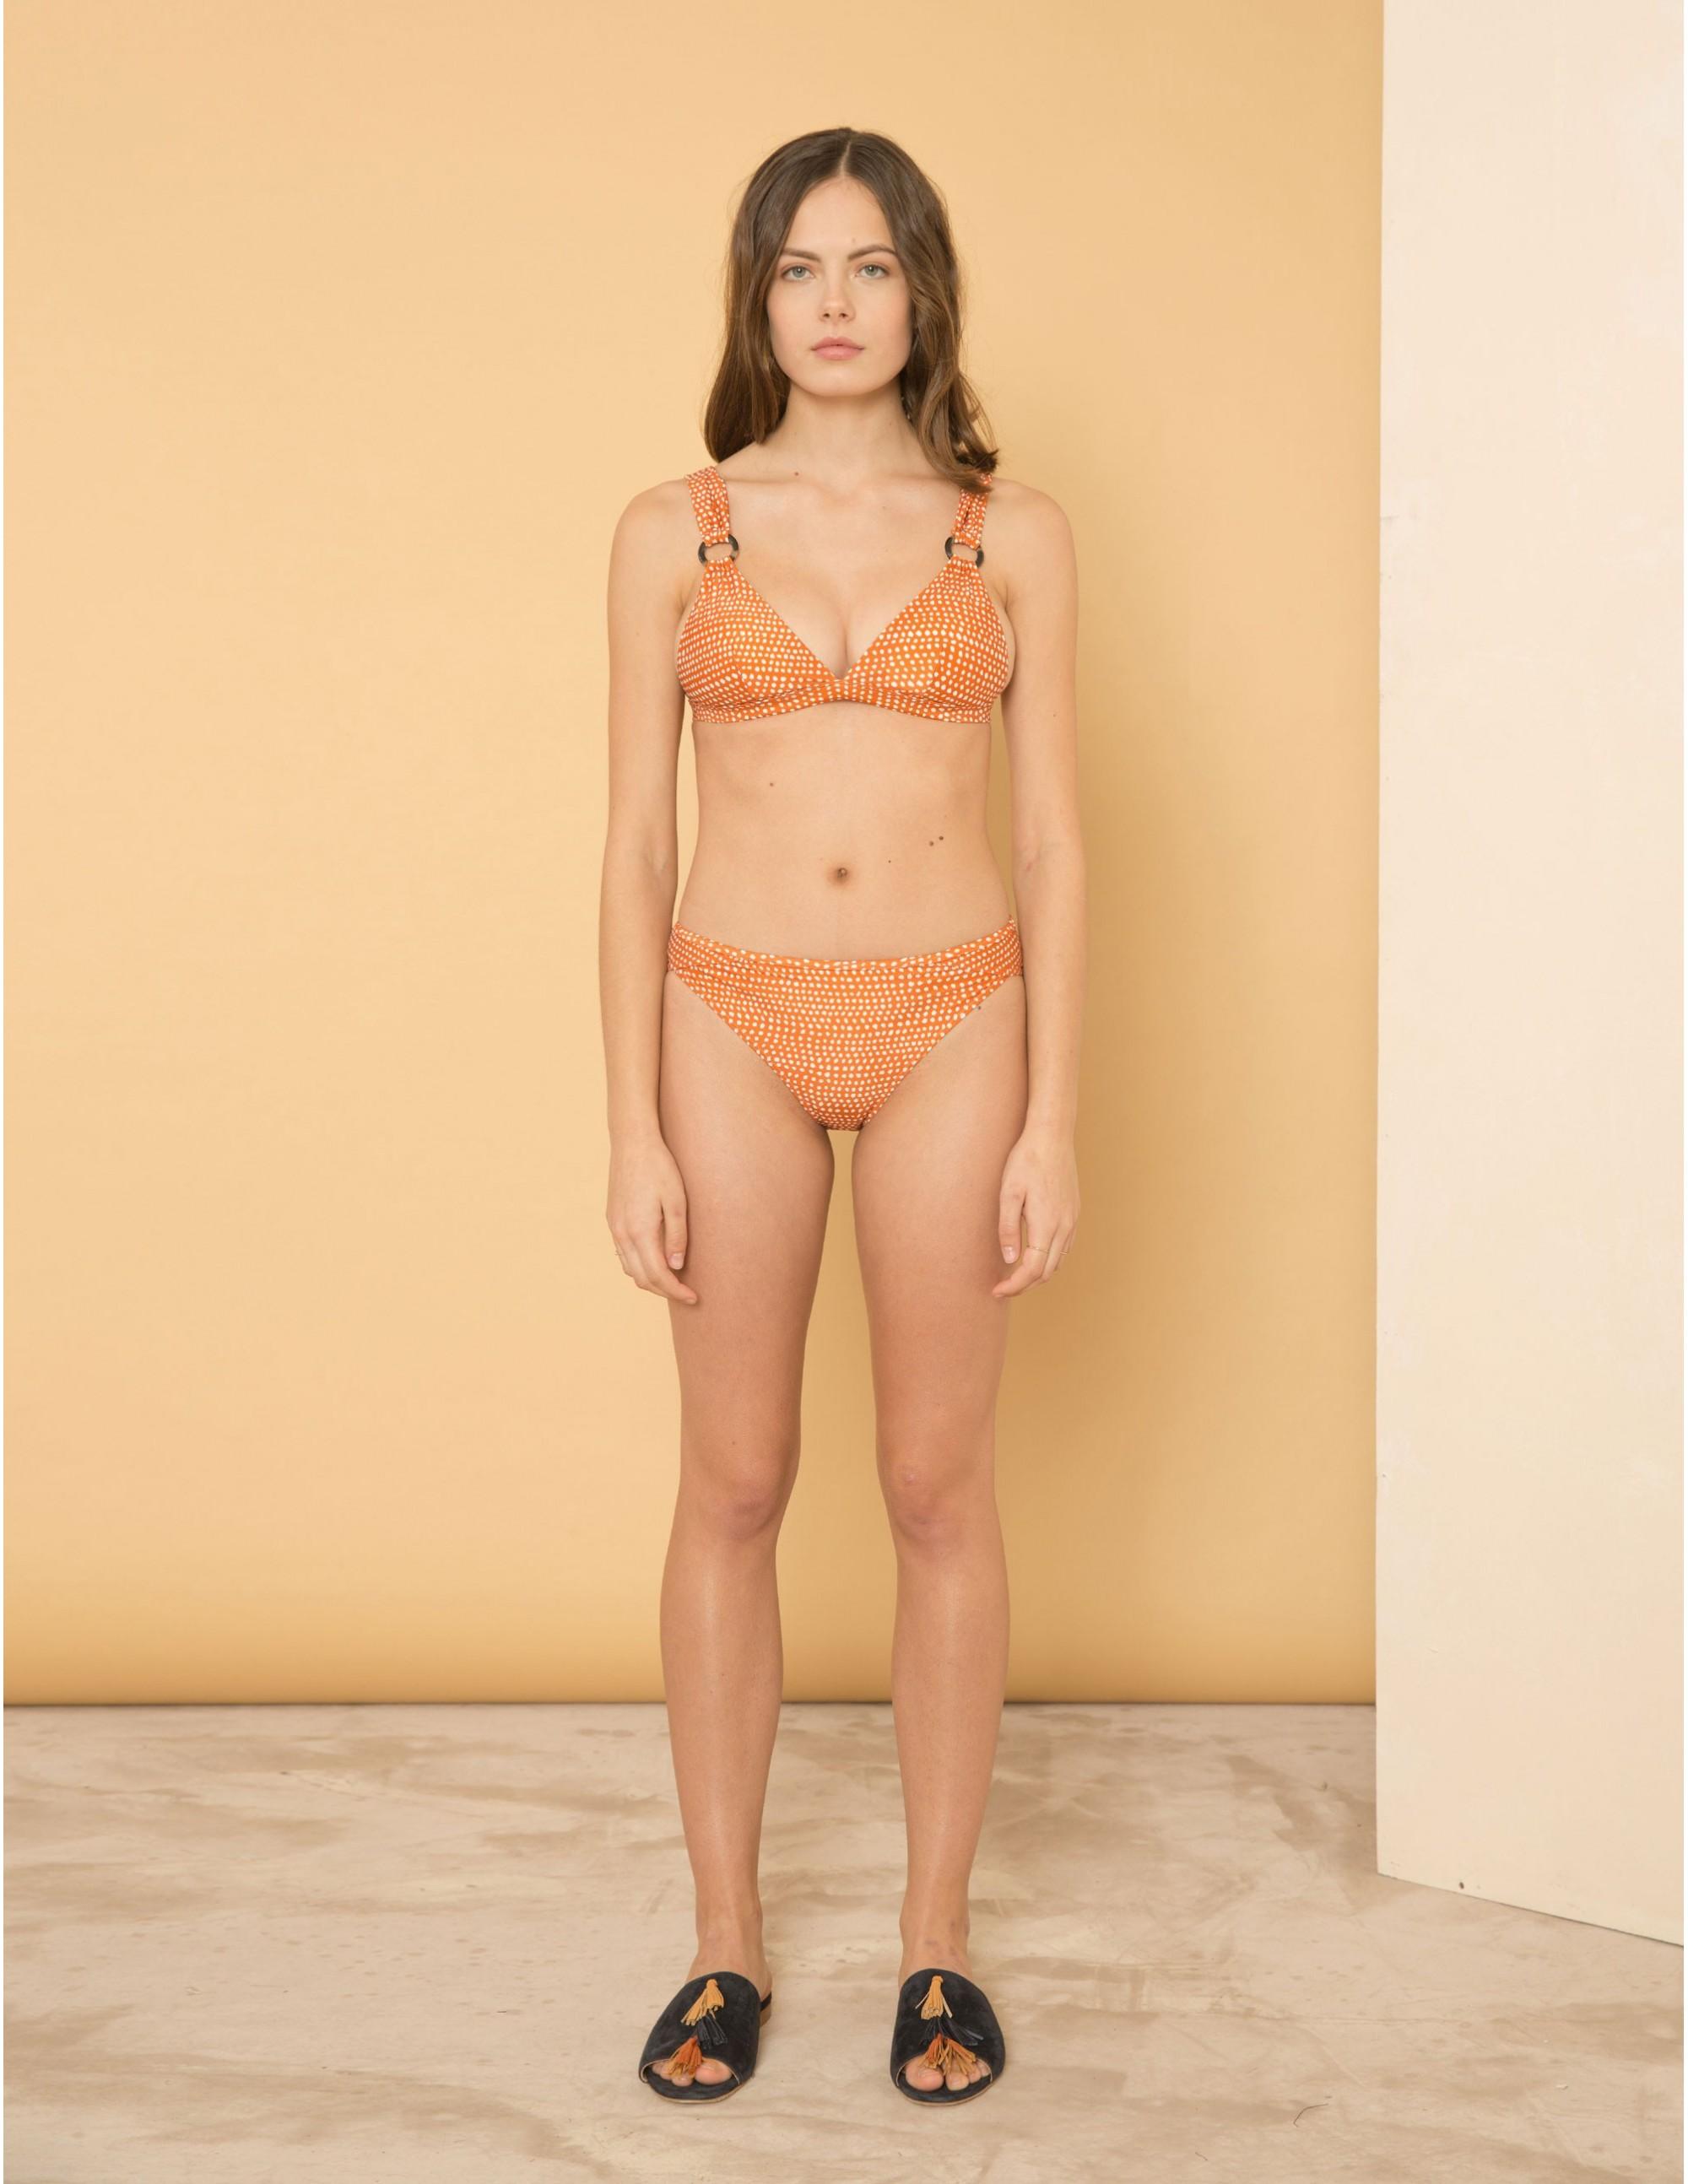 MAZIWI bikini bottom - CANDY FAWN